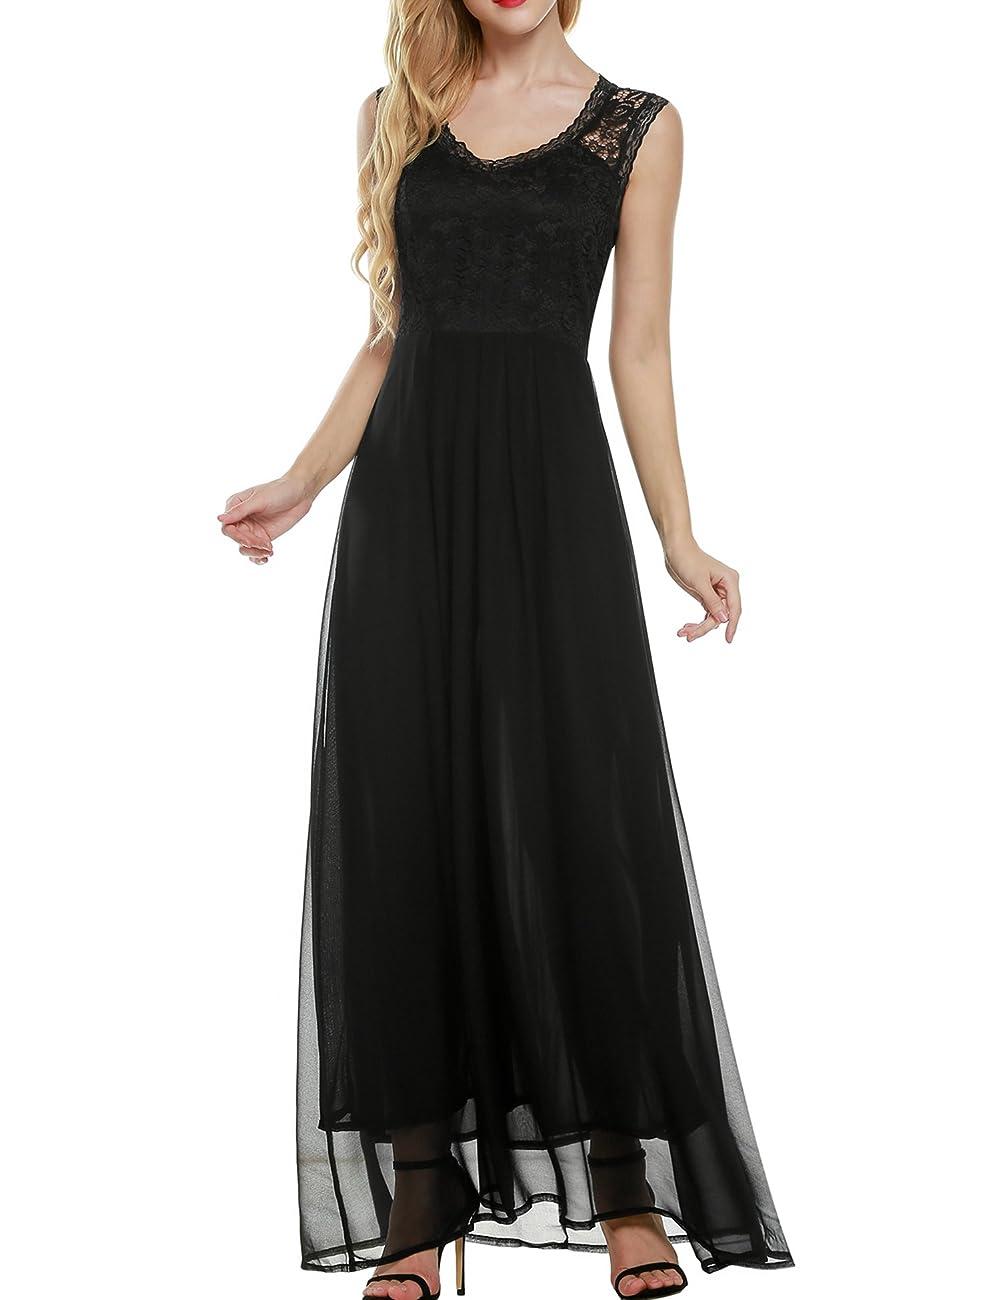 ANGVNS Women's Casual Deep- V Neck Sleeveless Vintage Maxi Dress 0